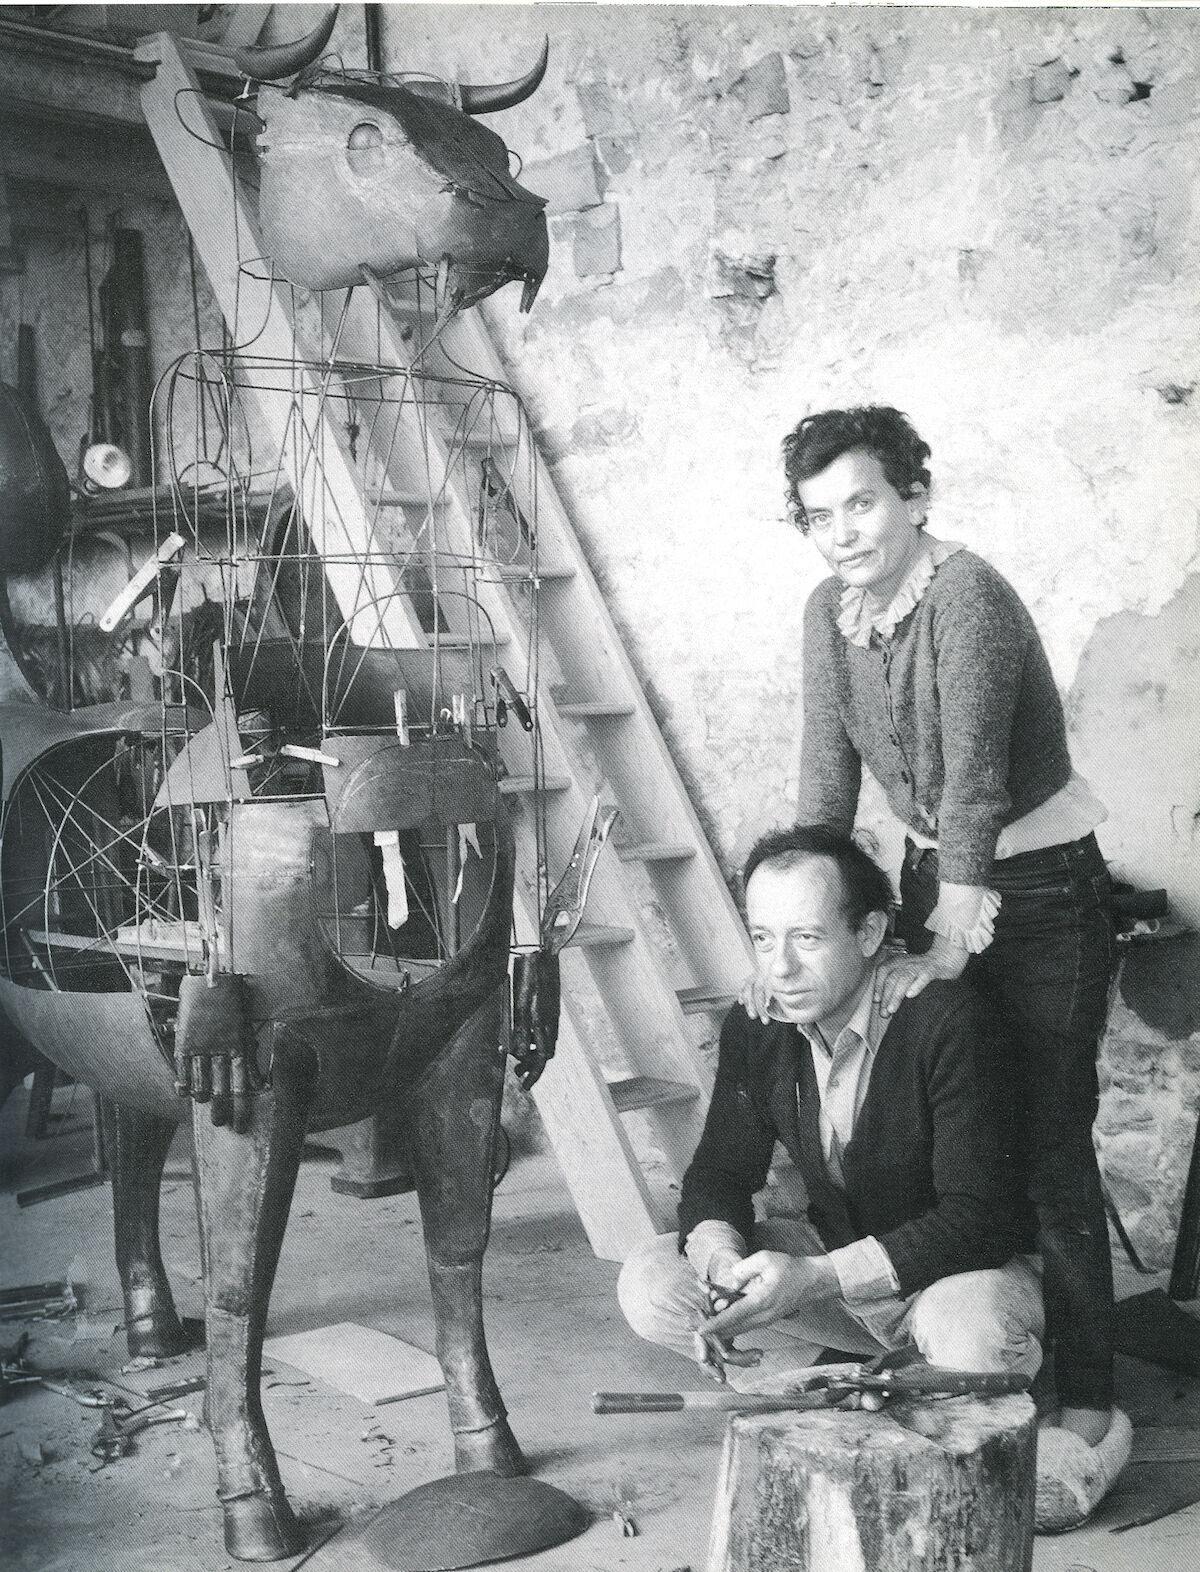 Claude et François-Xavier Lalanne in their studio in Ury, 1970. © Claude Lalanne. Courtesy of Ben Brown Fine Arts.